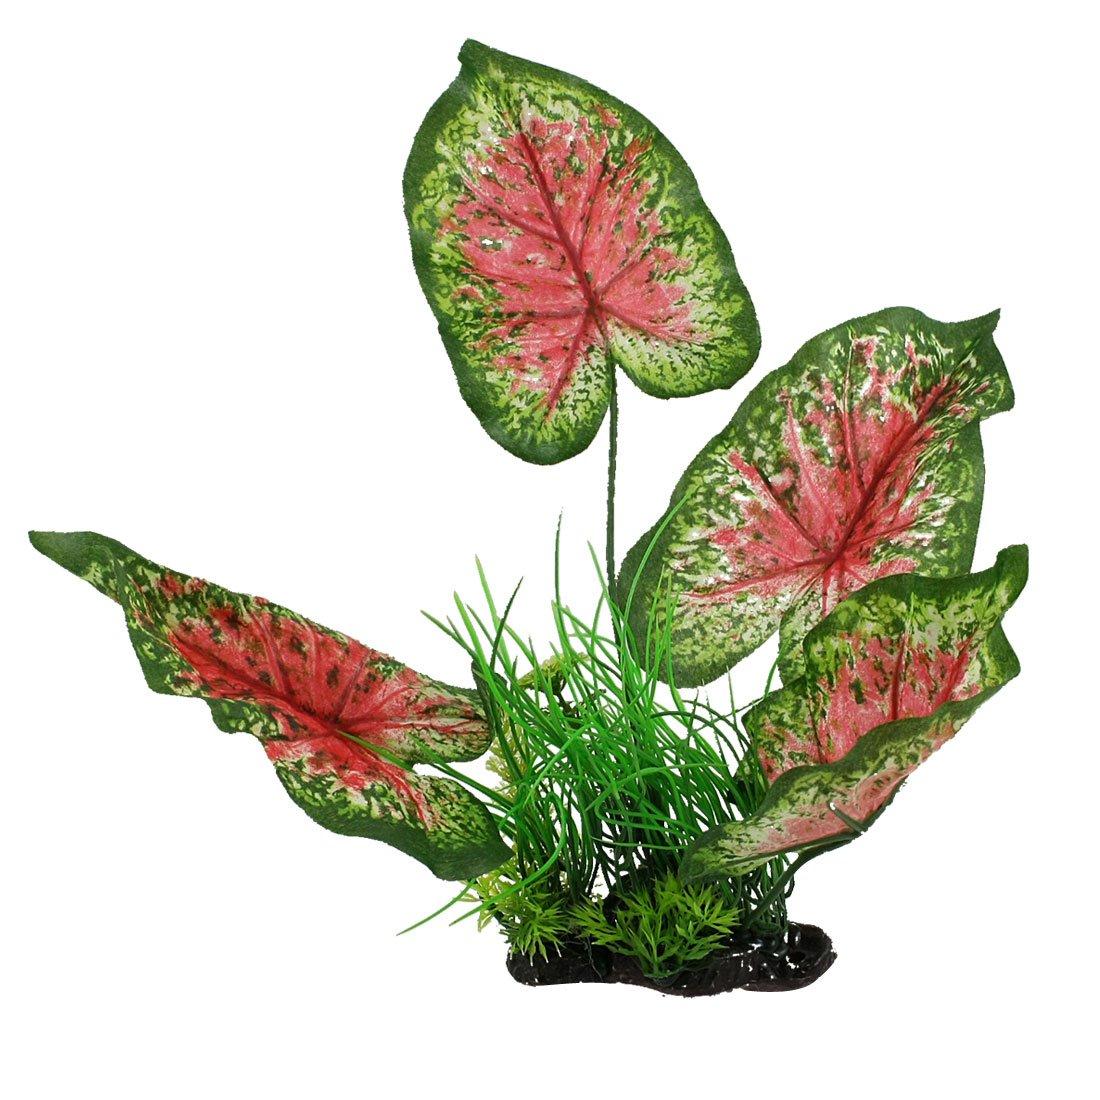 uxcell 人工水草 アクアリウム  水族館の装飾植物  グリーン フクシア B0089KTMYS